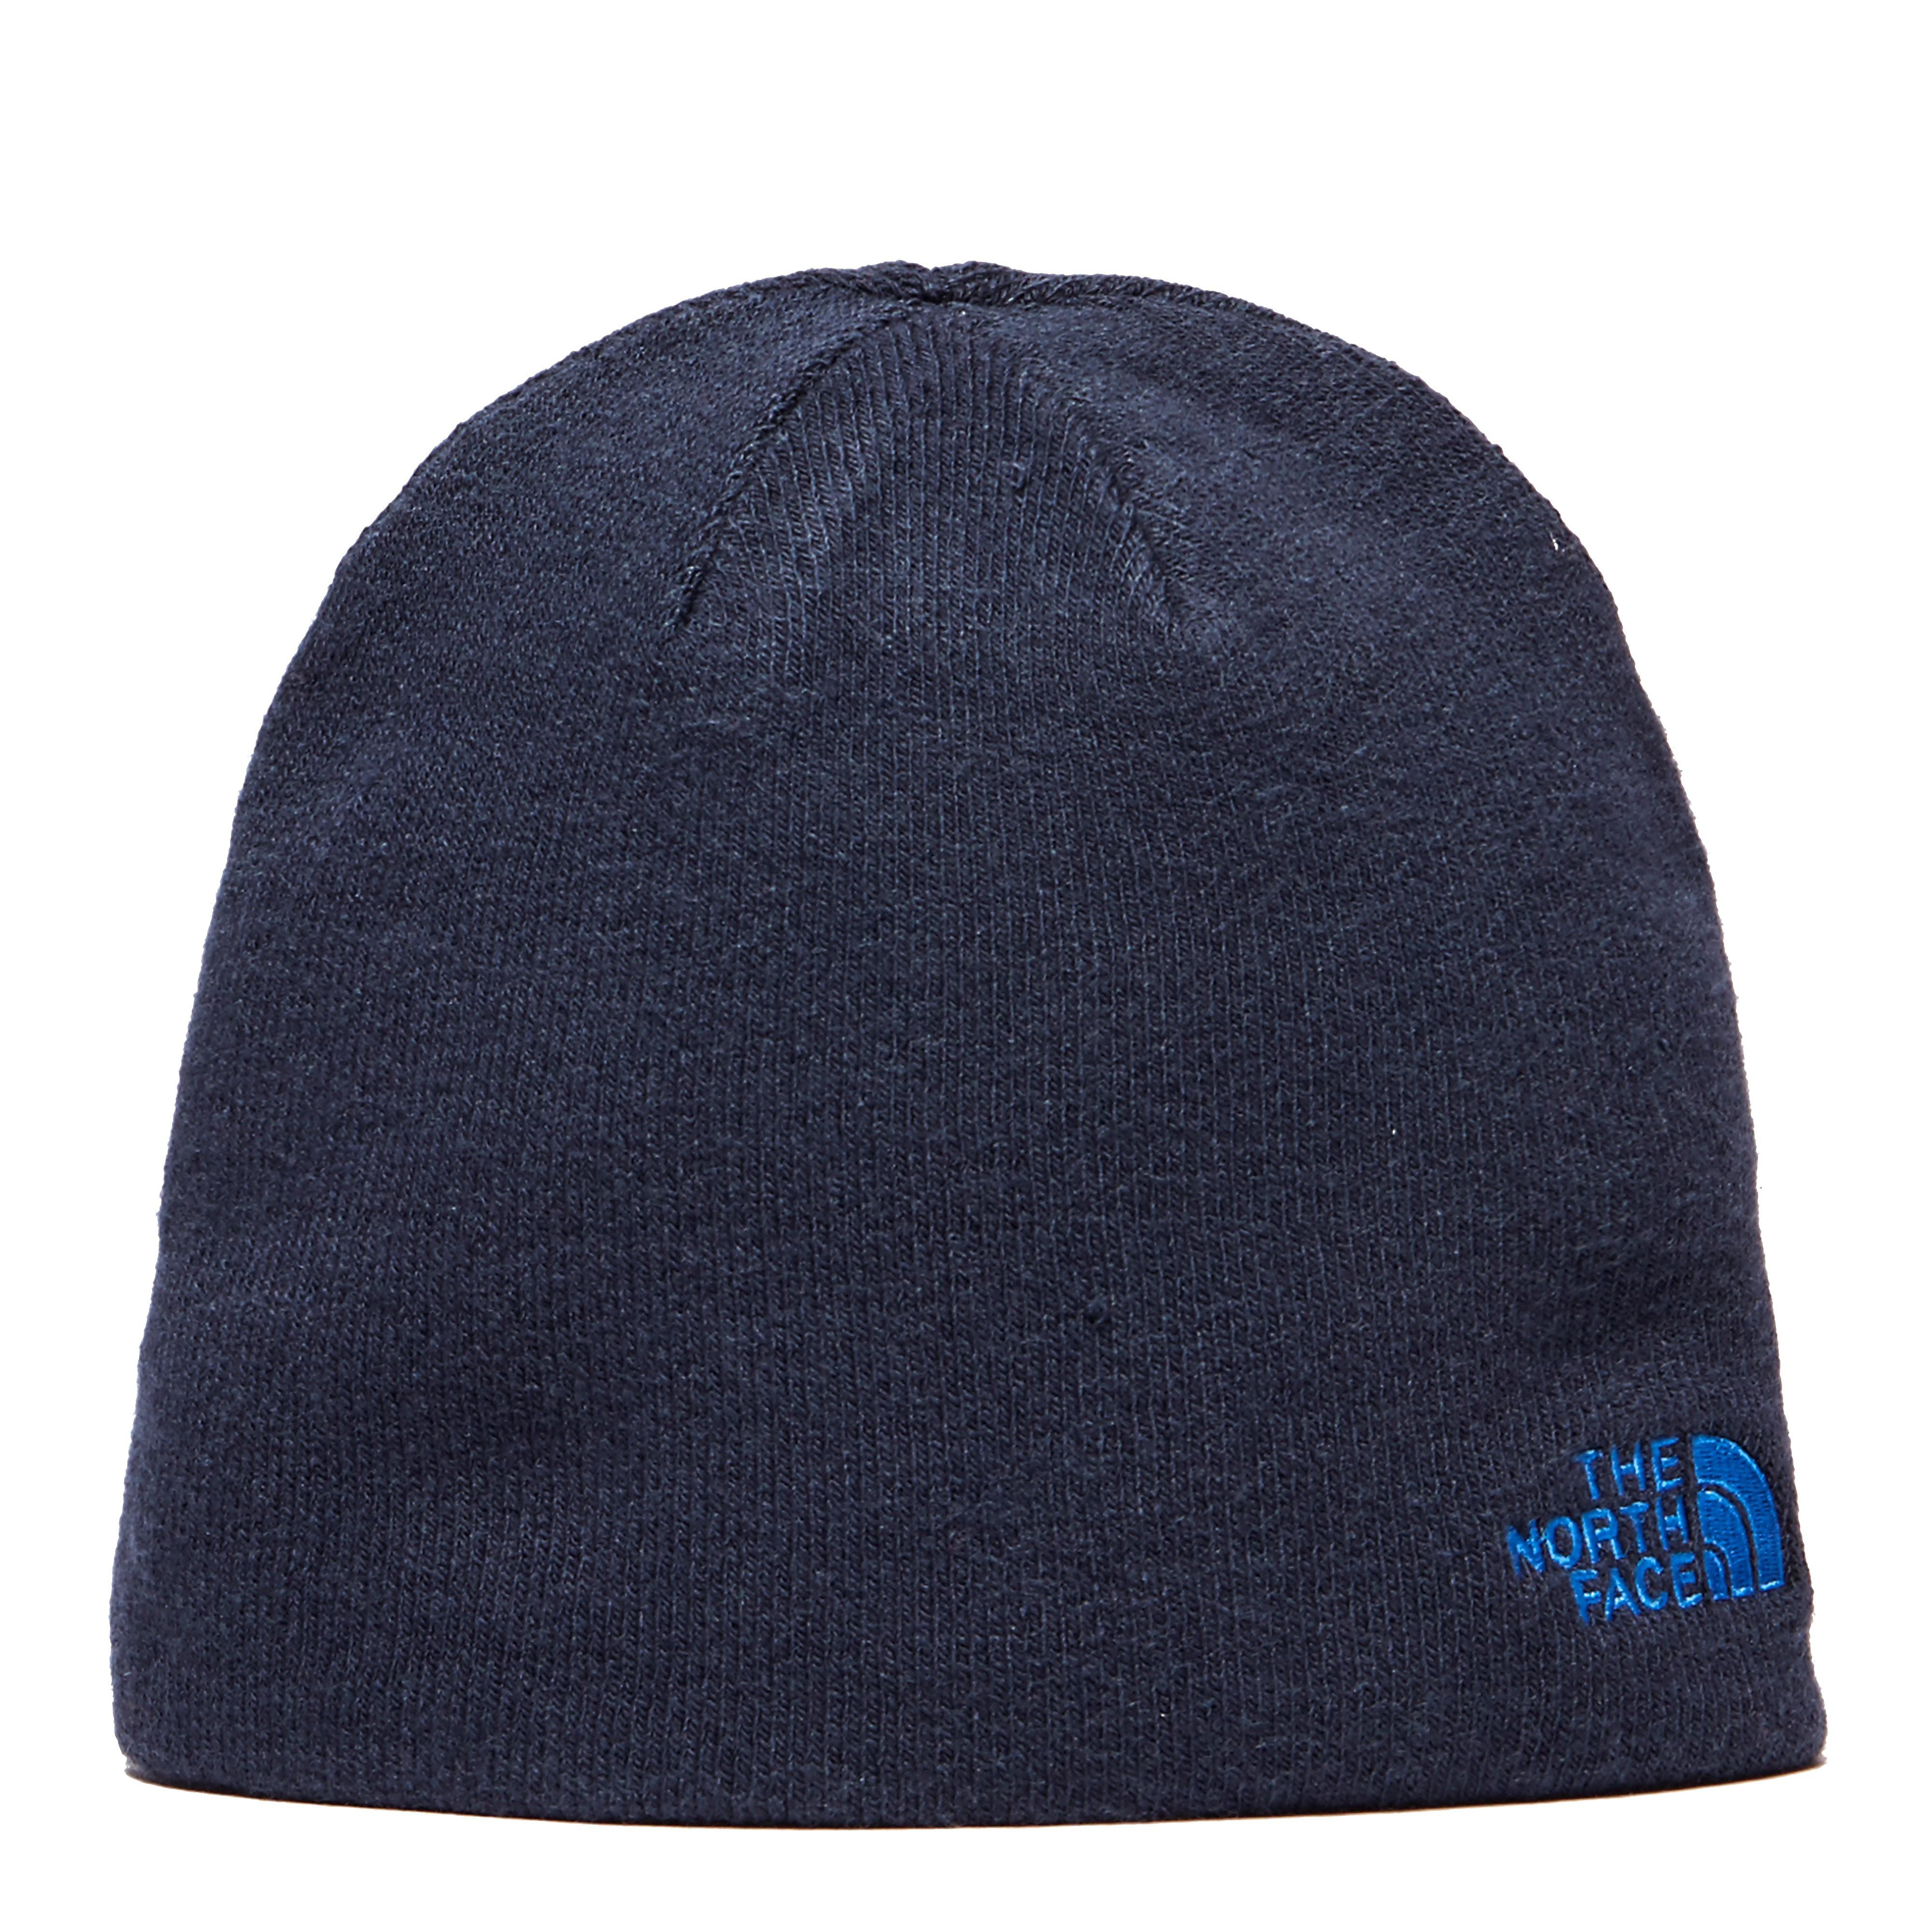 The North Face Unisex Gateway Beanie Hat